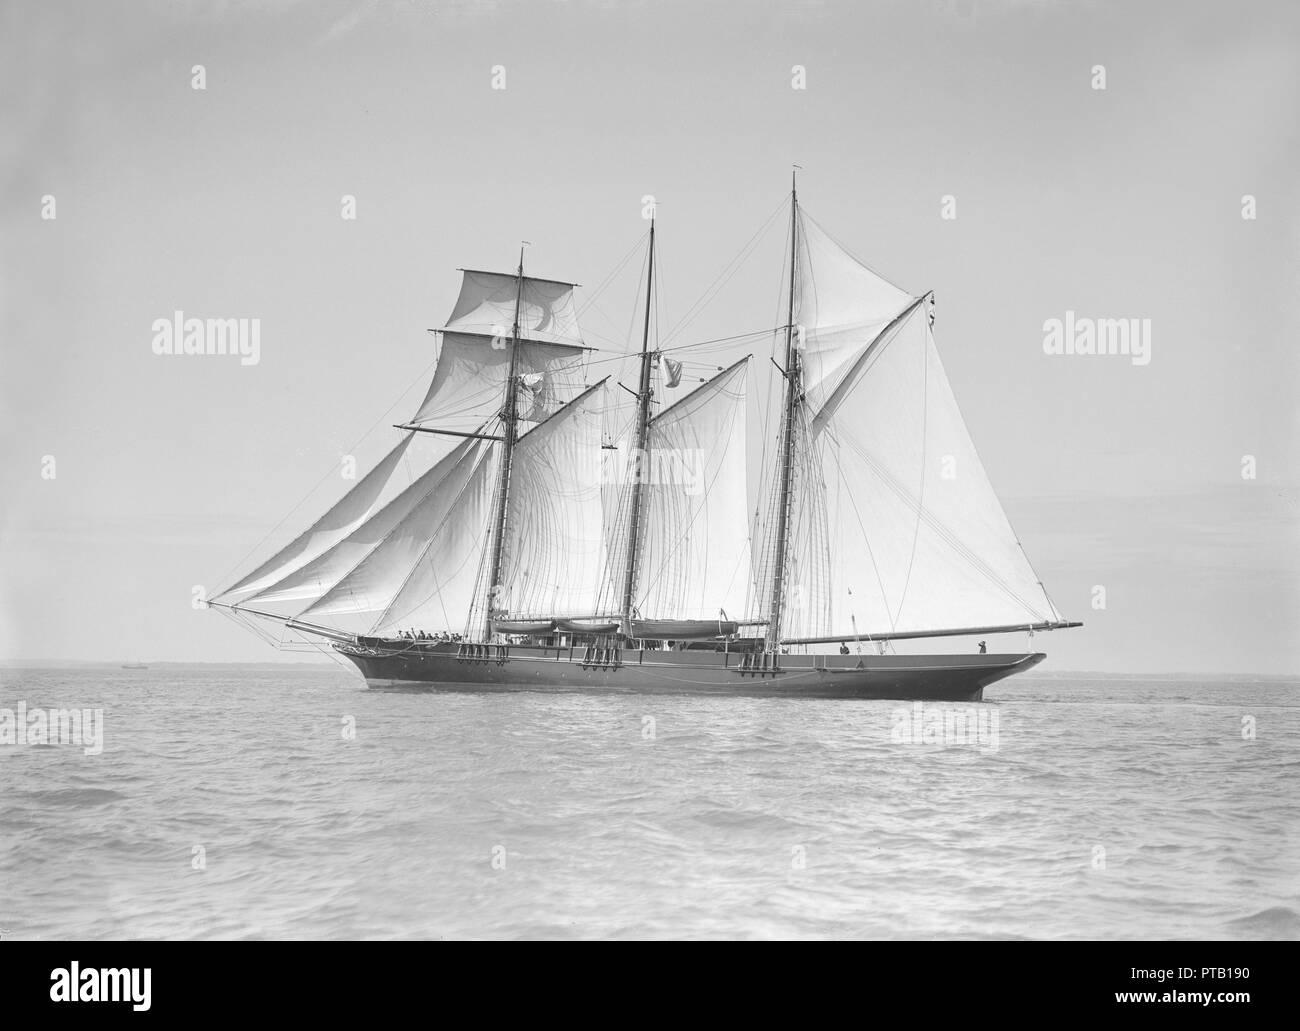 Auxiliary sailing ship 'Garina' under sail, 1911. - Stock Image